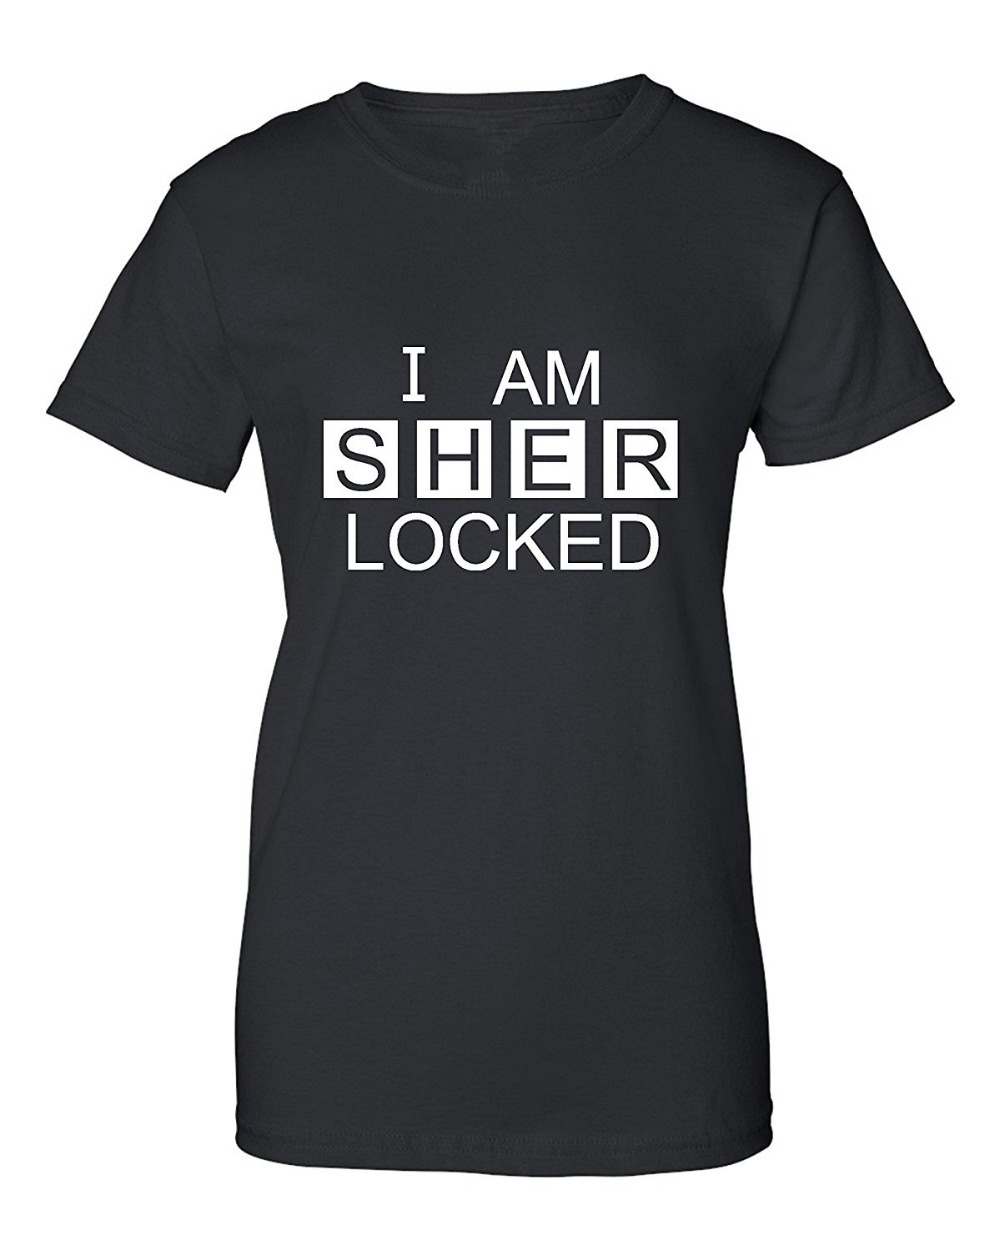 Shirt design inspiration - Cool T Shirts Women S Crew Neck Short Design T Shirts I Am Sherlocked Sherlock Holmes Inspired